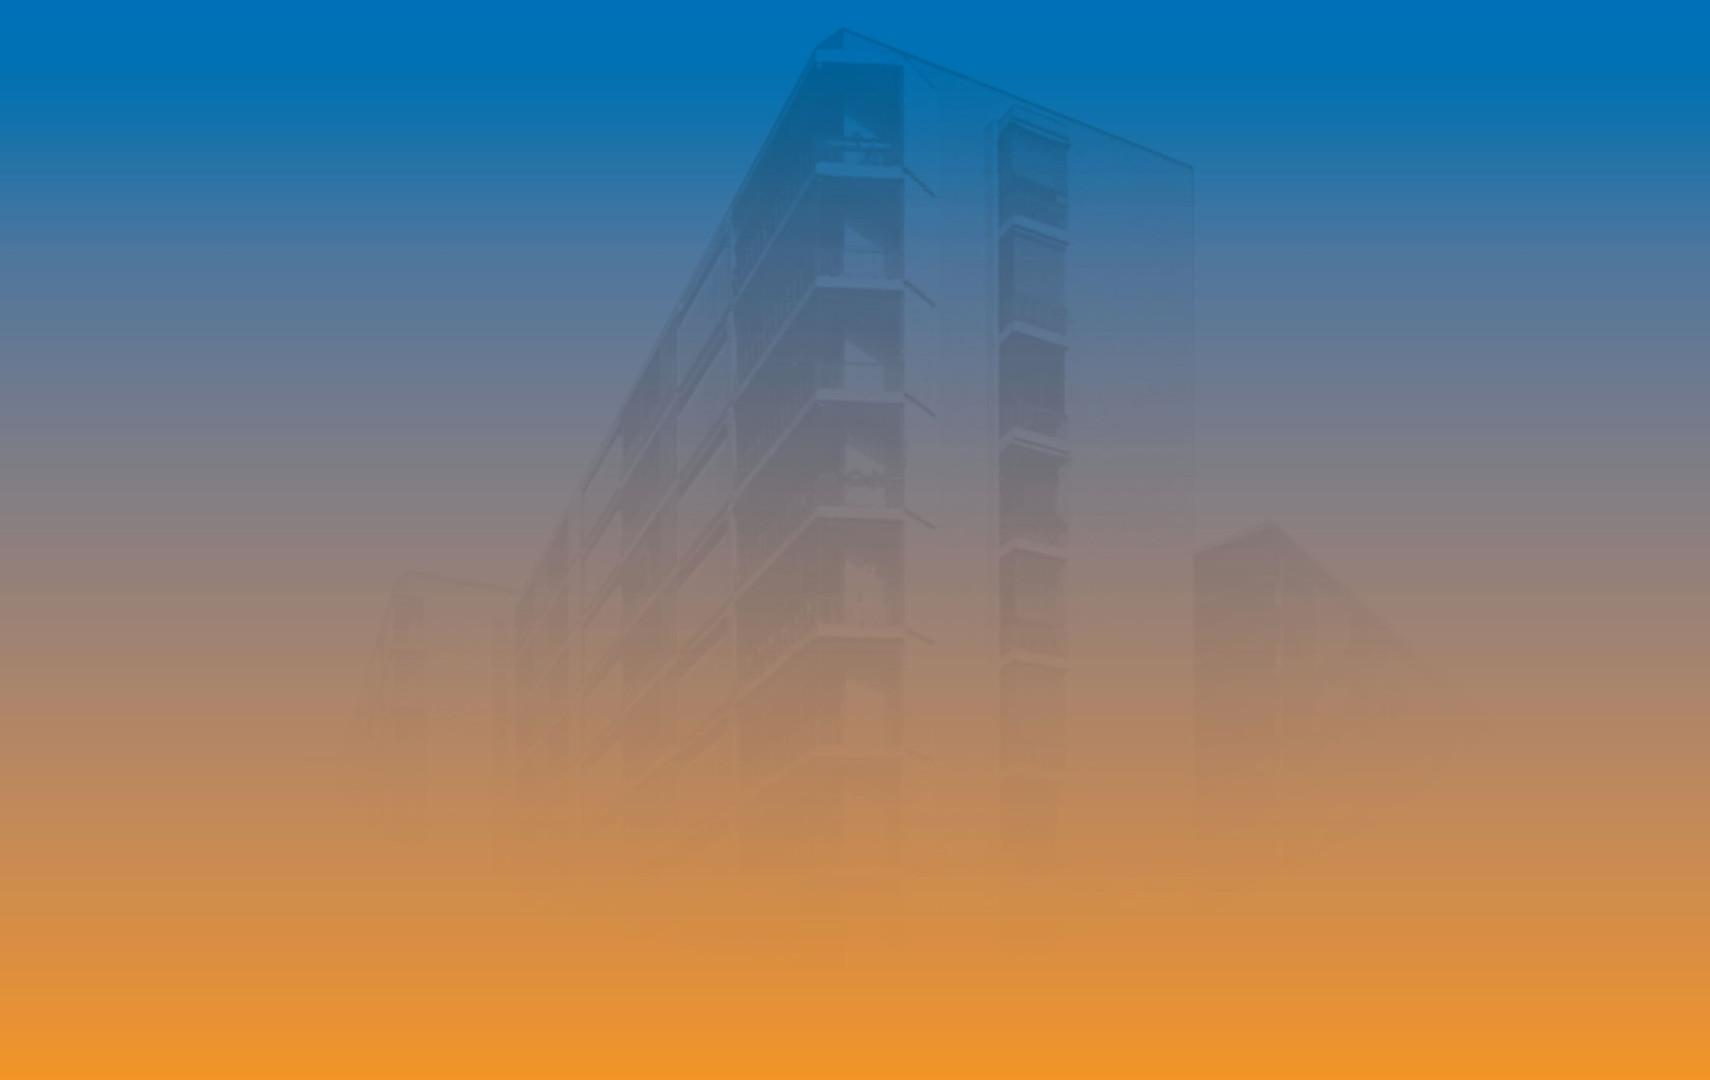 Optimistic Suburbia 2: Middle-class large housing complexes